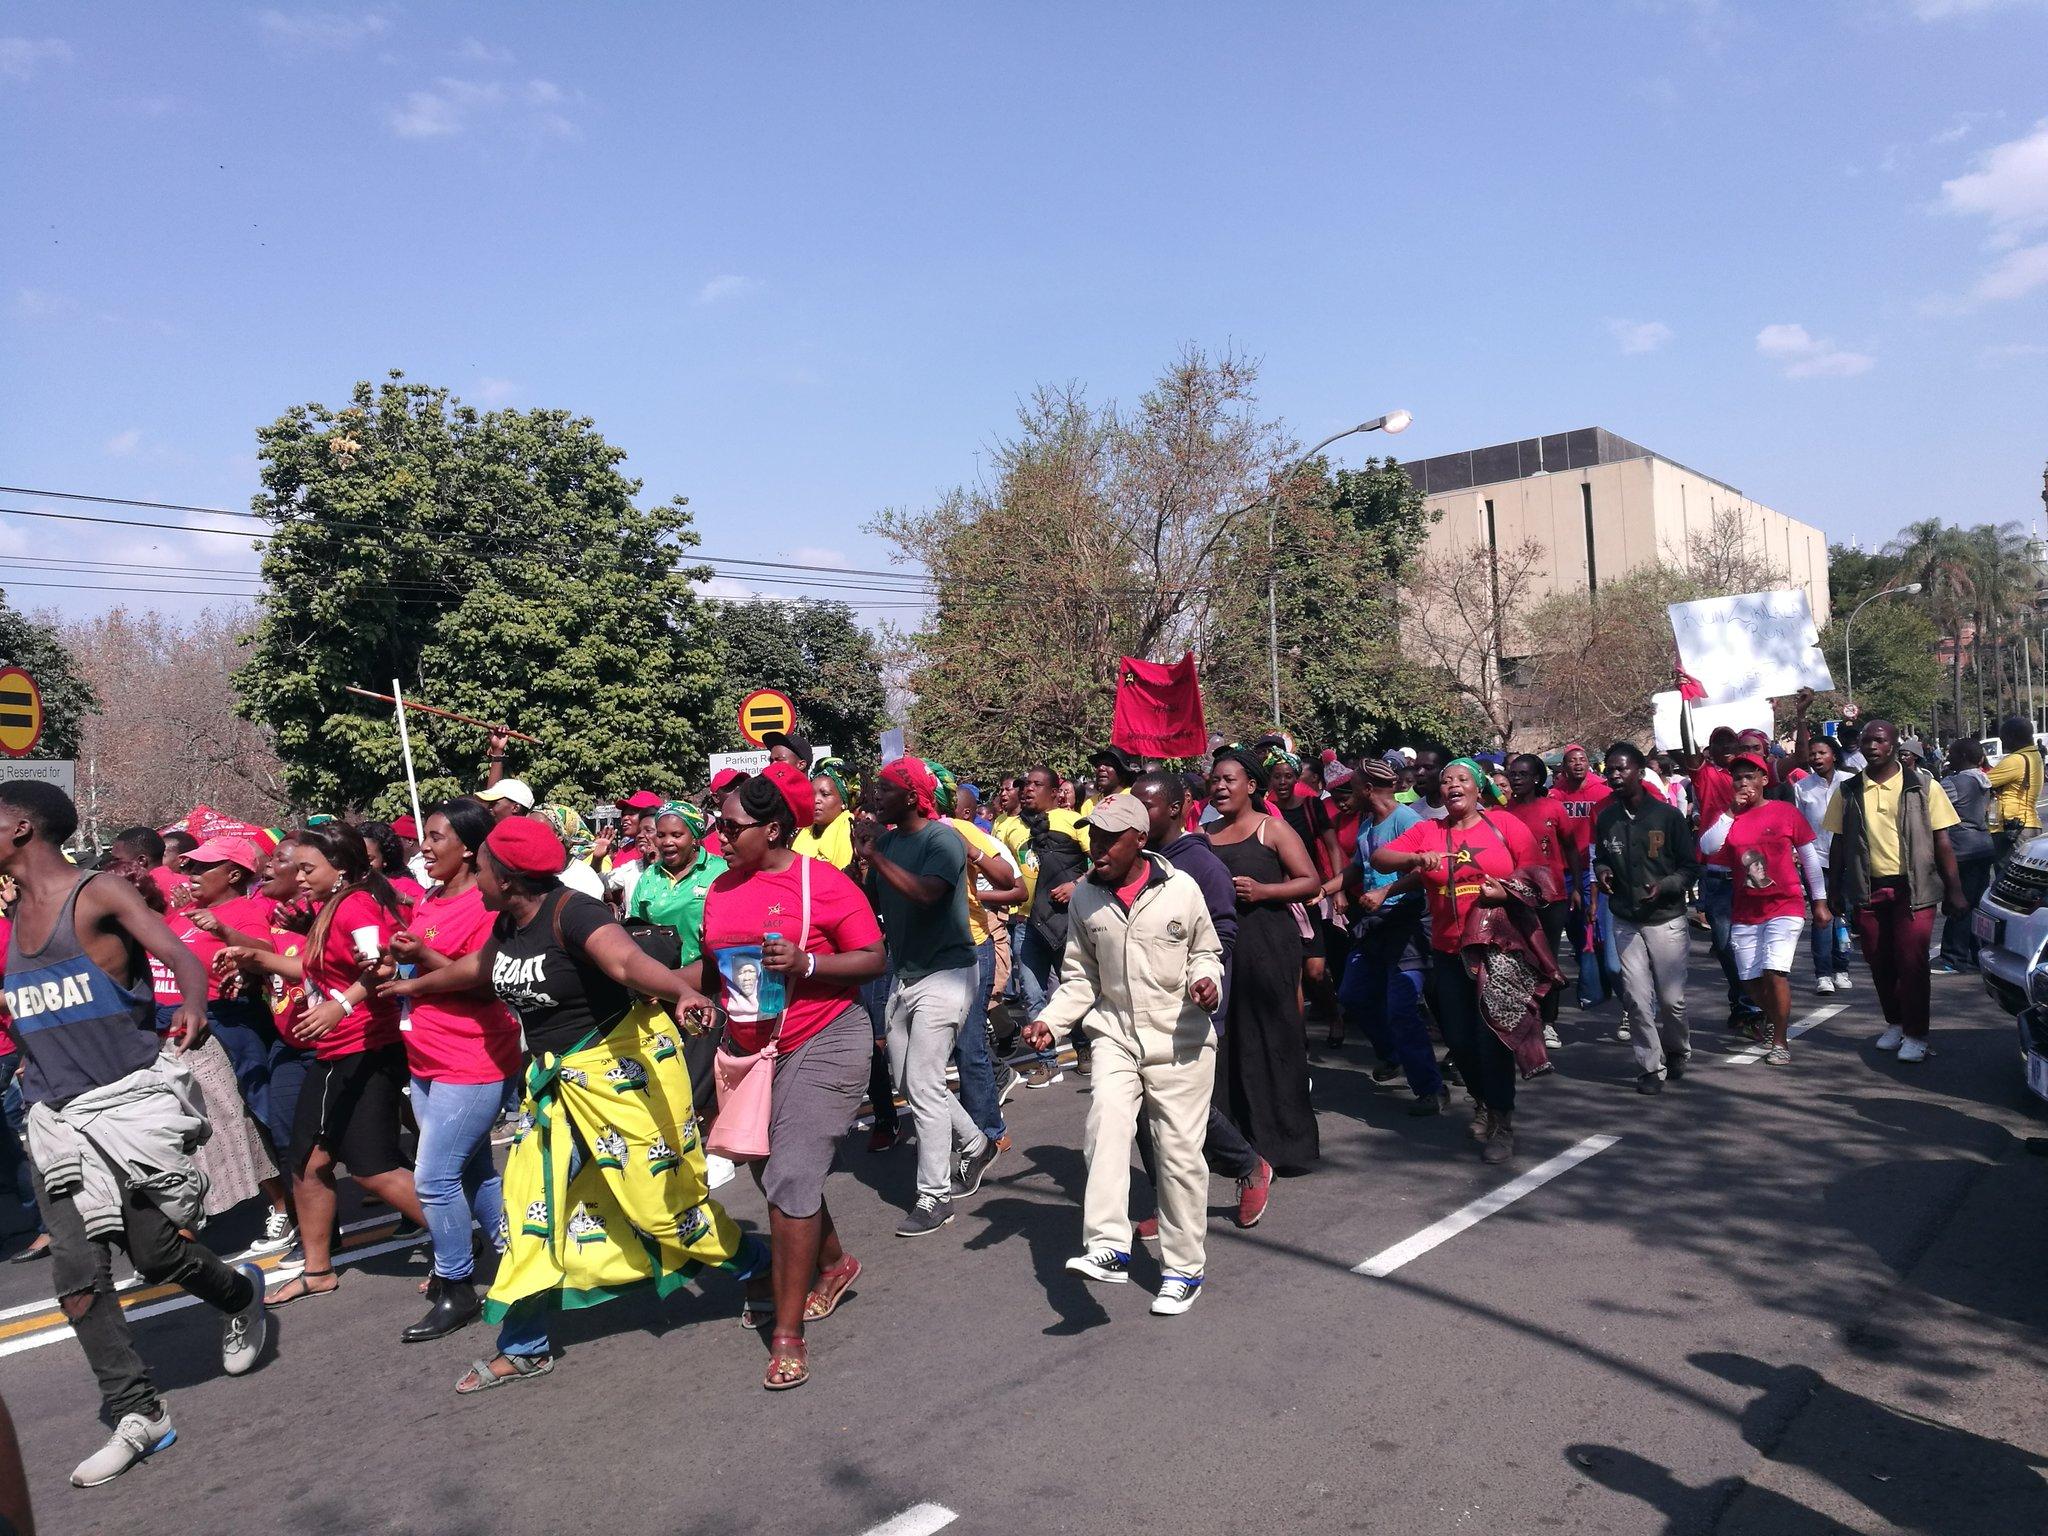 Thumbnail for #SABCKZN ANC vs ANC in KwaZulu-Natal